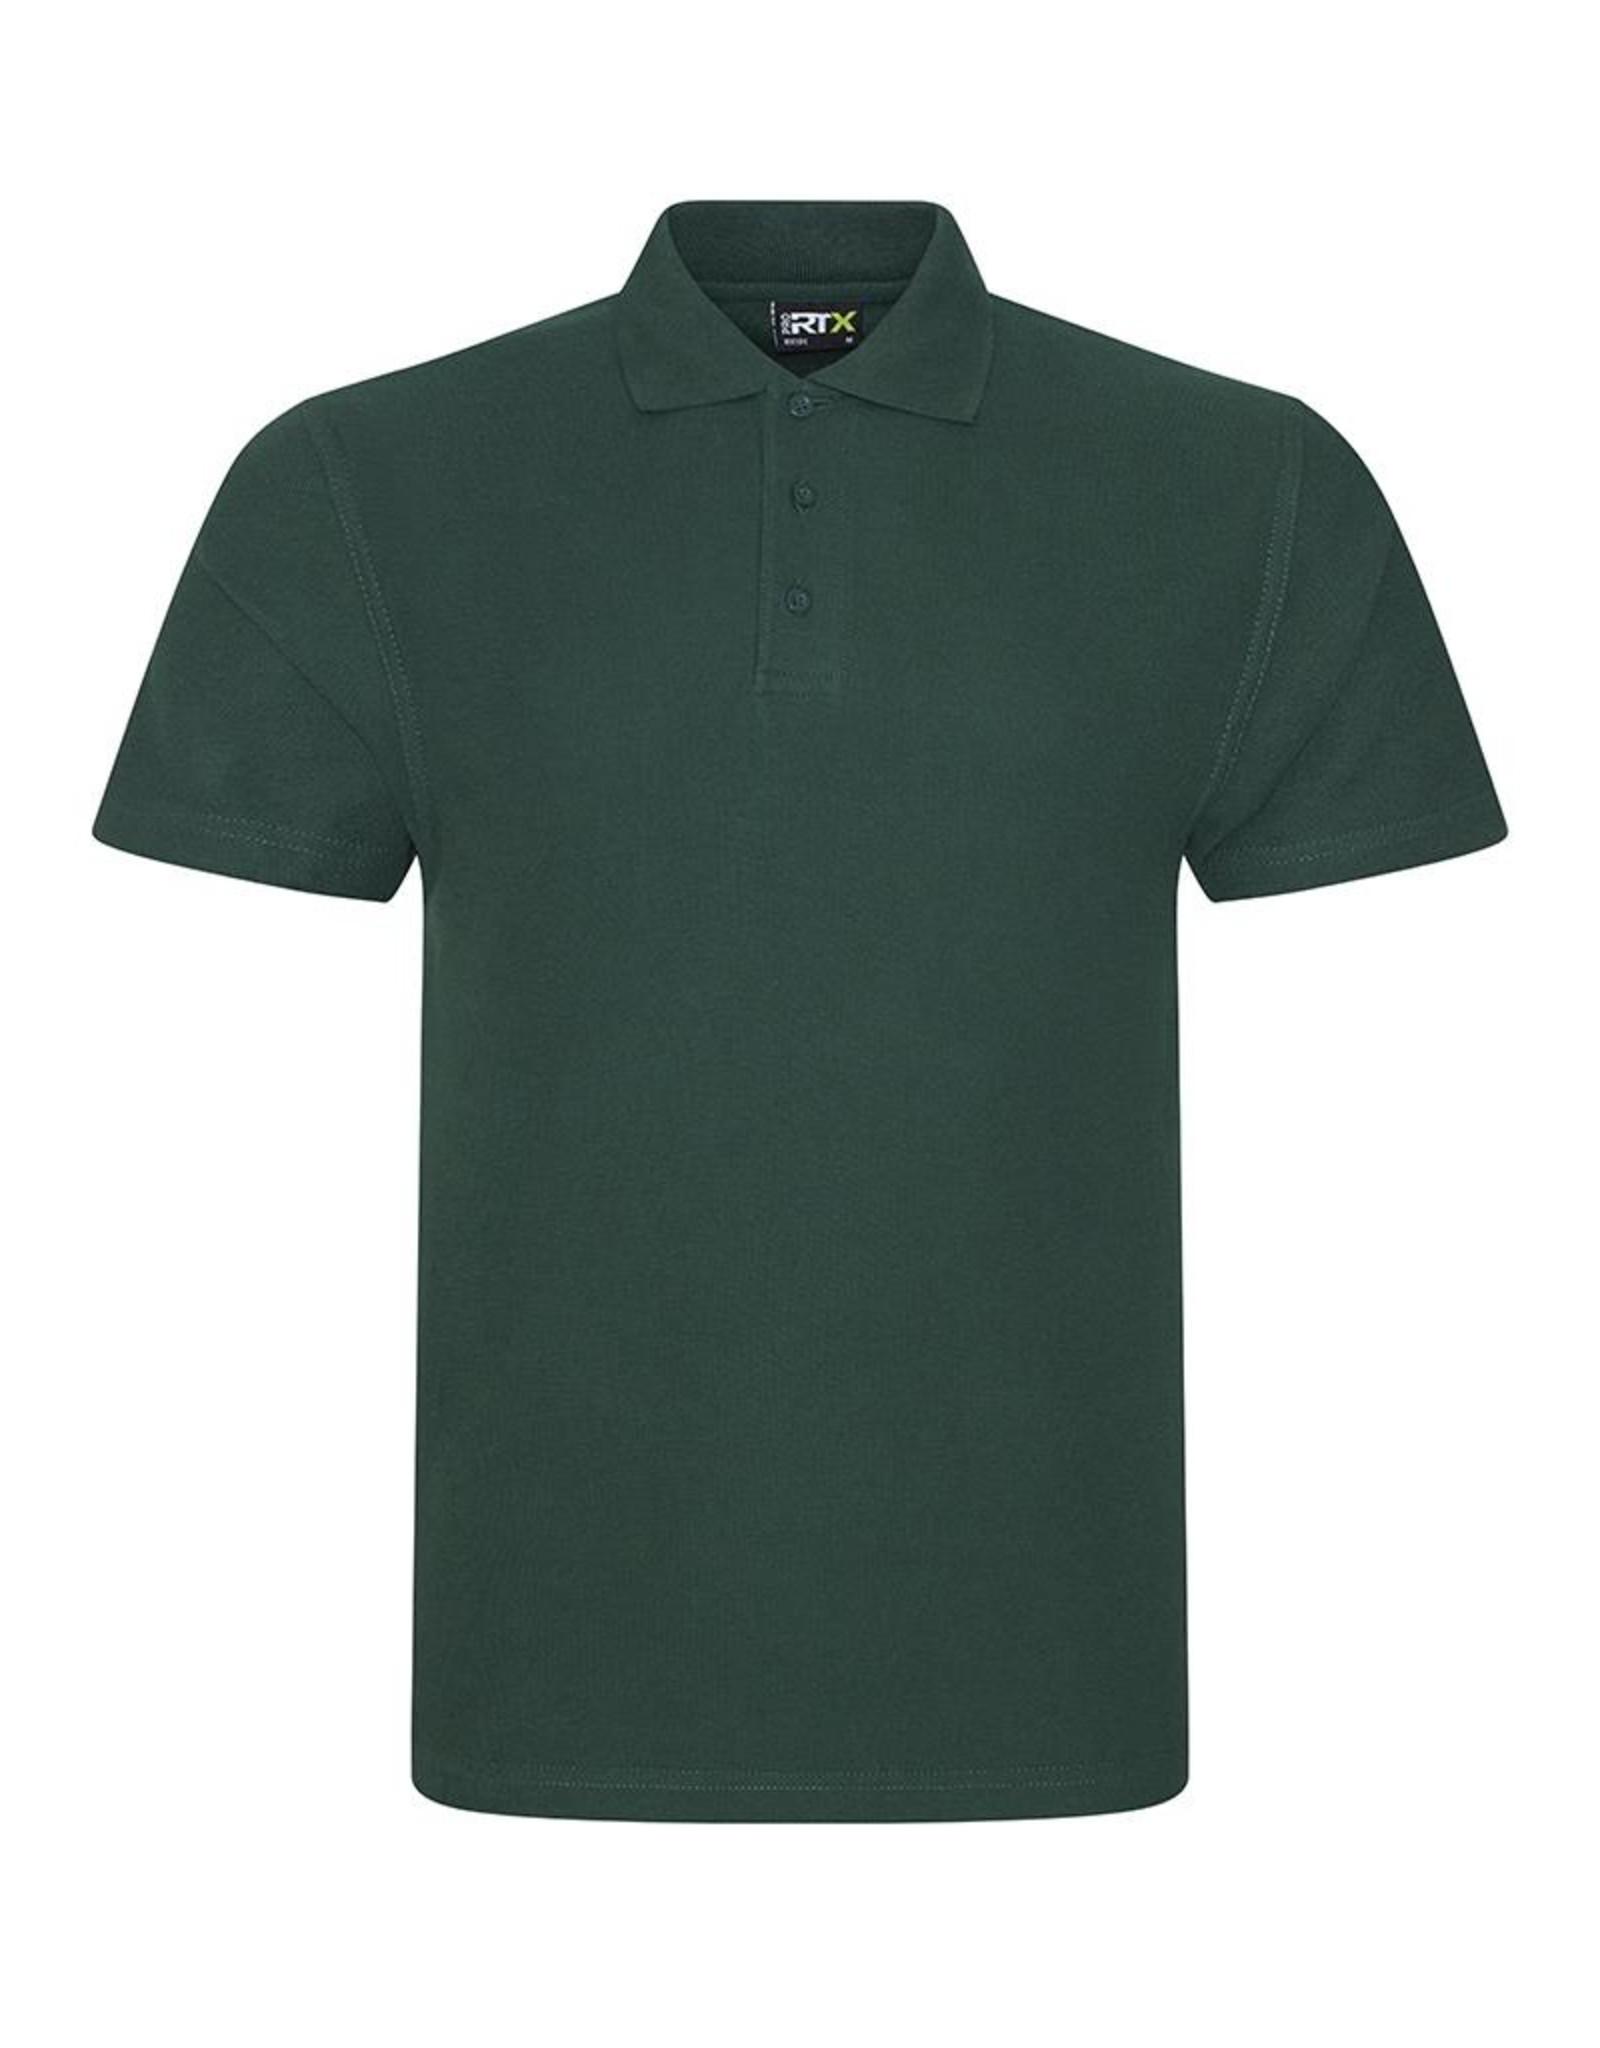 Pro RTX POLOSHIRT piqué workwear bosgroen